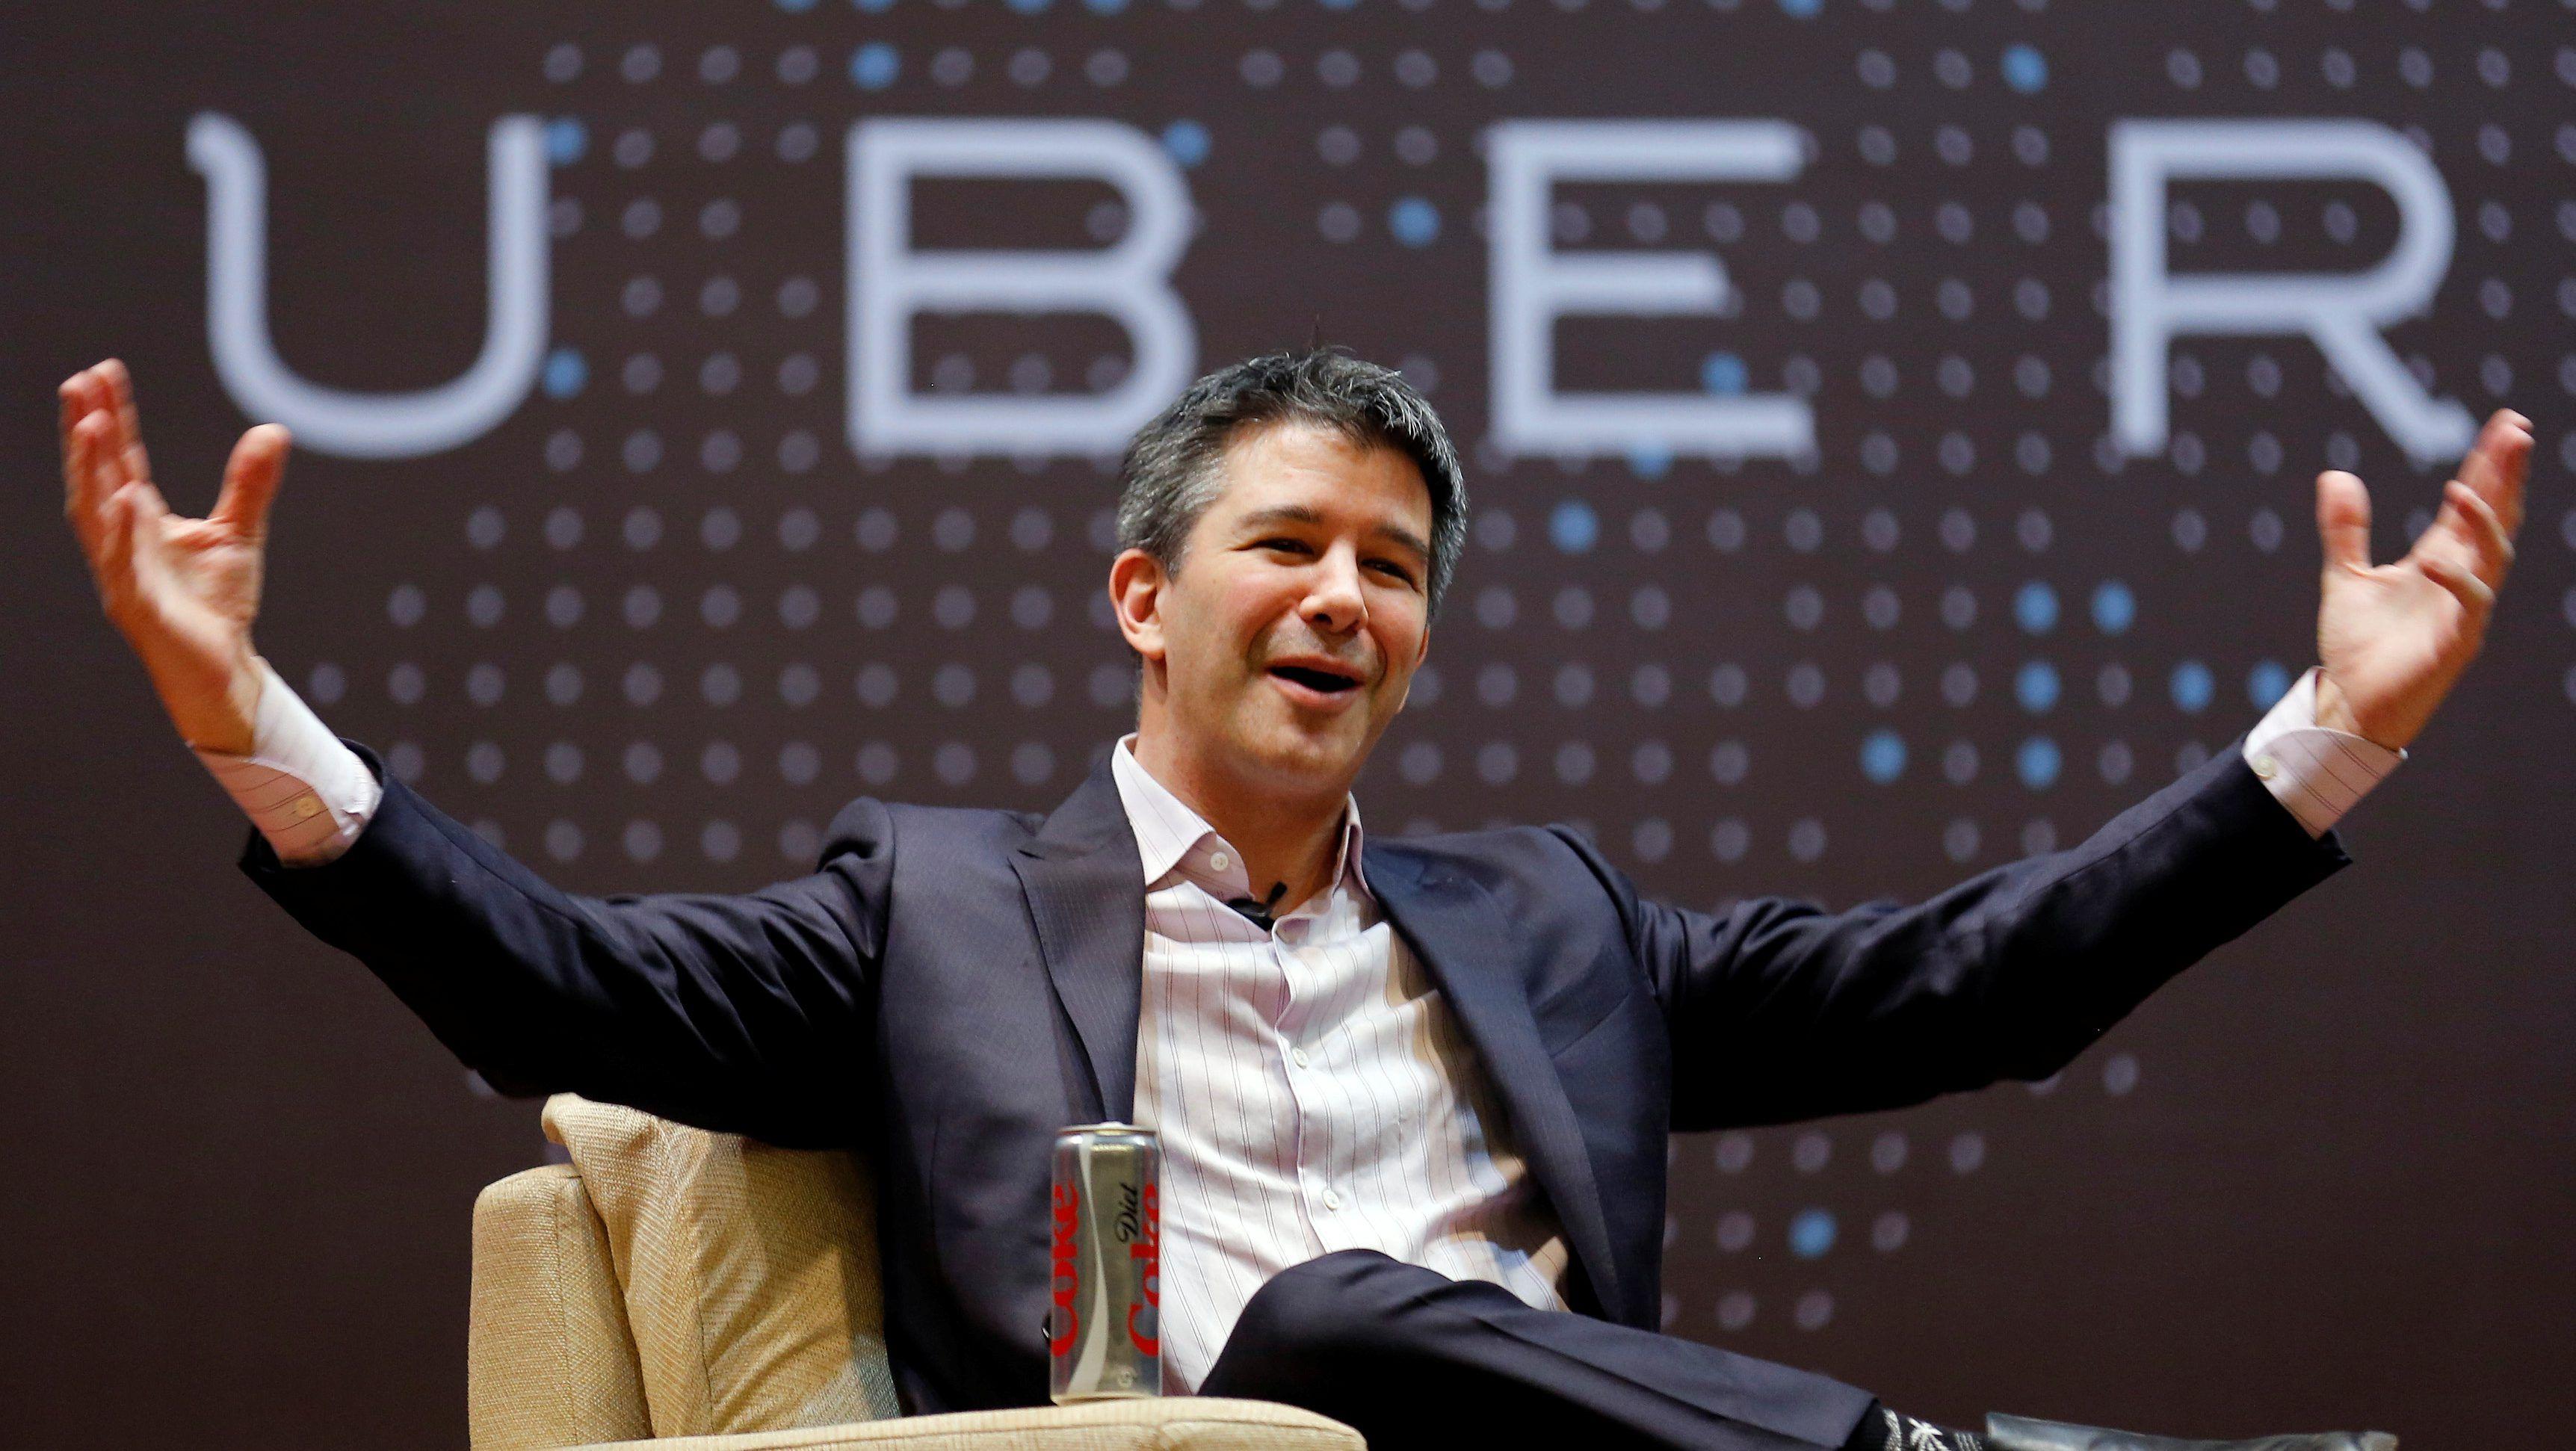 Travis Kalanick, former CEO of Uber.